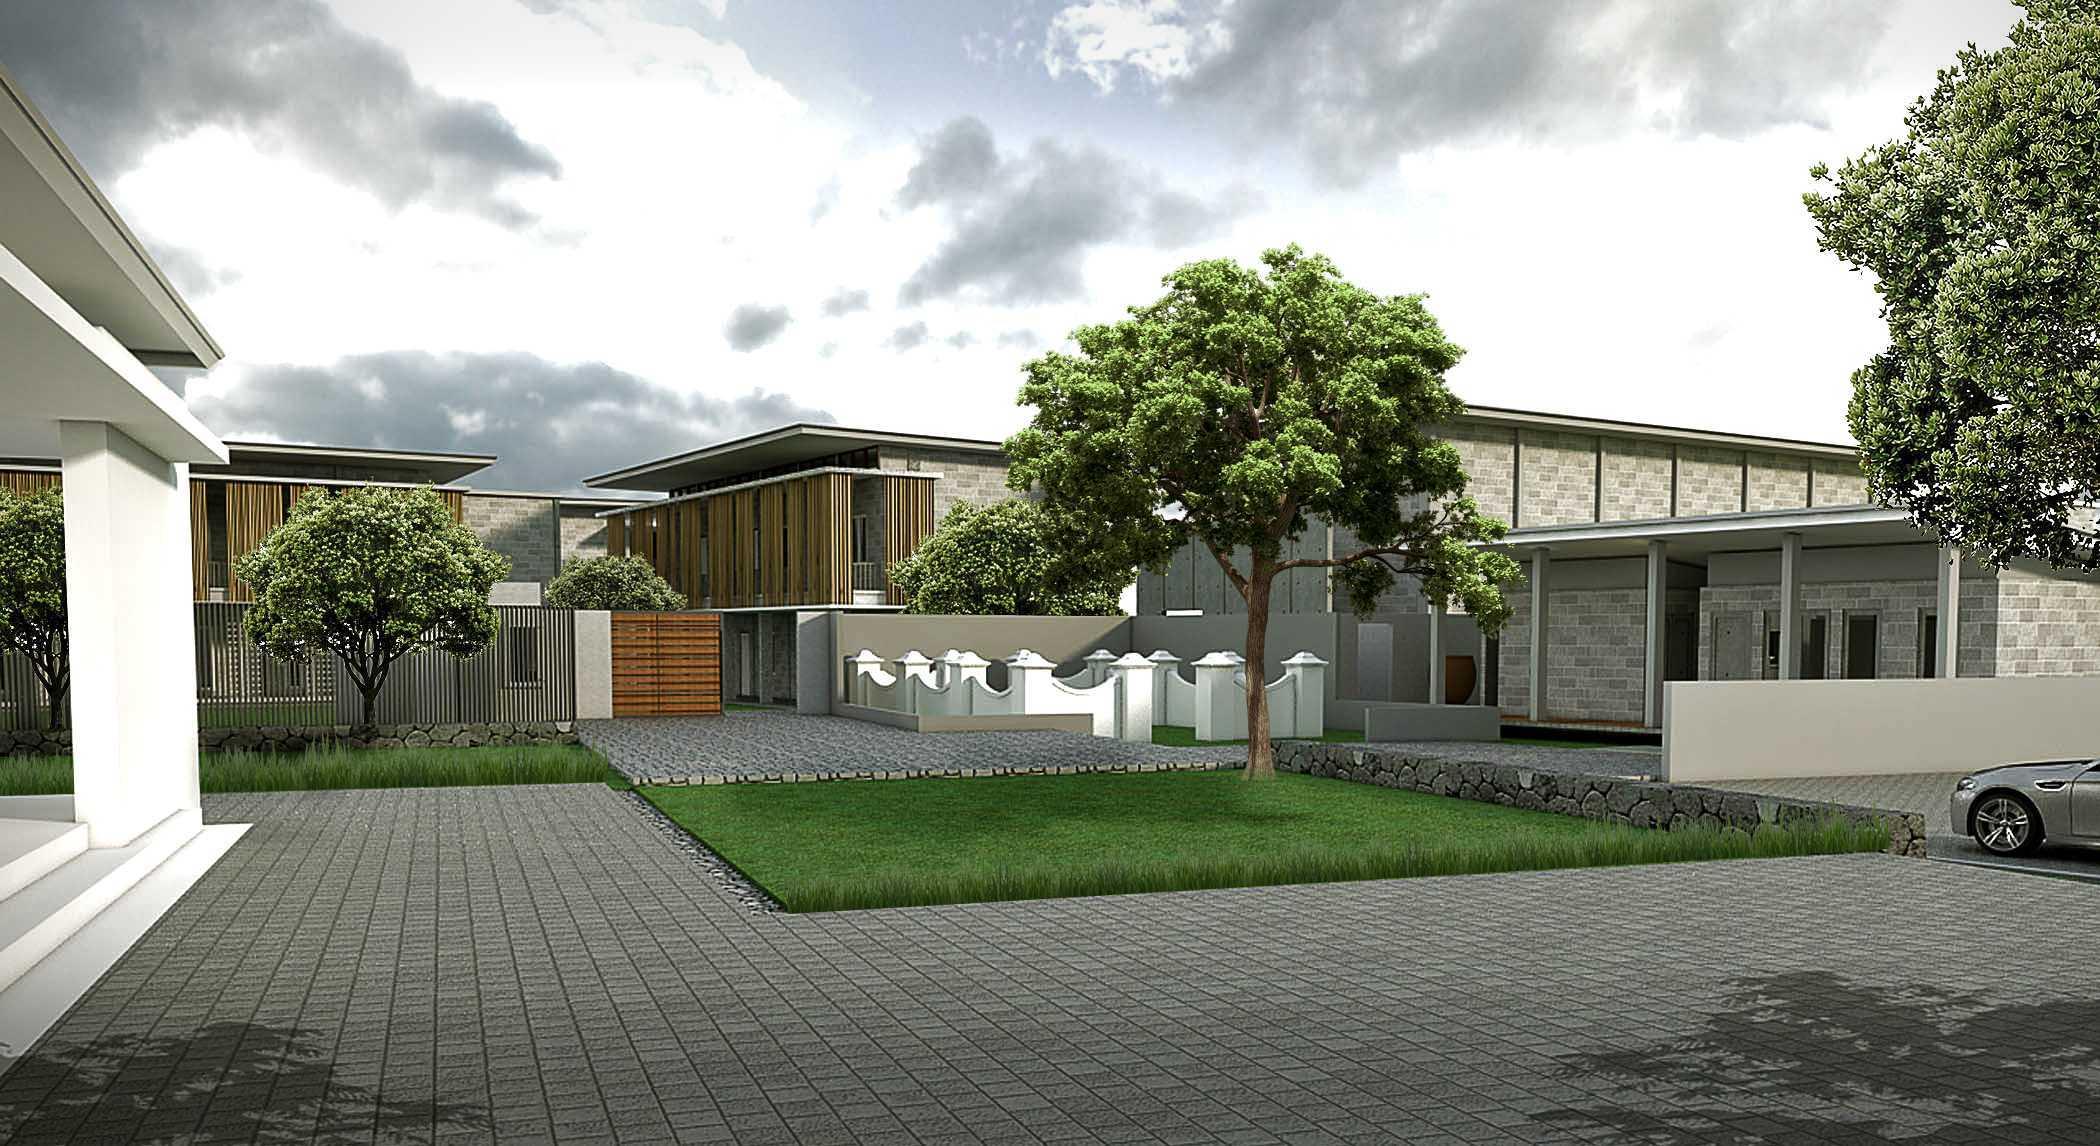 Pt. Garisprada Asrama Sentul Sentul, Babakan Madang, Bogor, West Java, Indonesia Sentul Front View Modern  22517